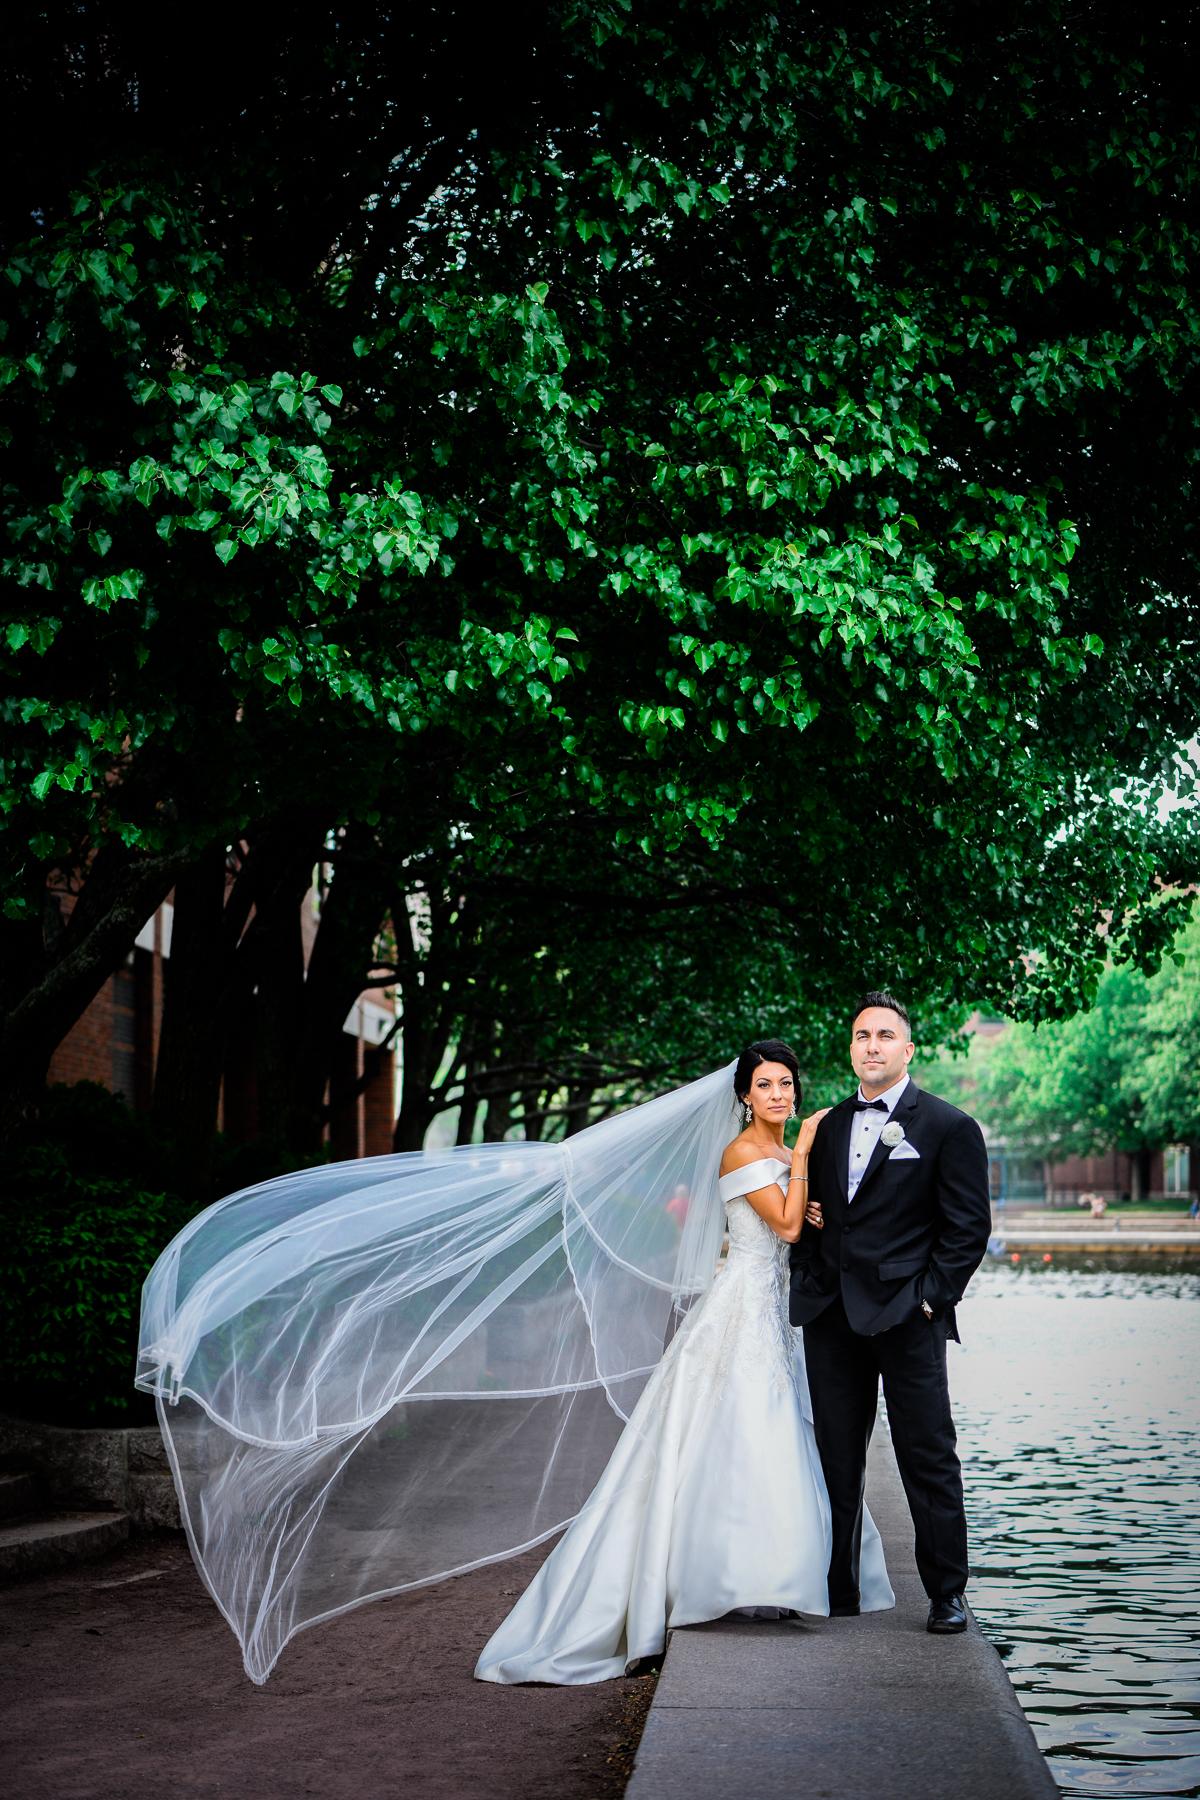 Boston Wedding Photographer Christian Pleva-75.jpg